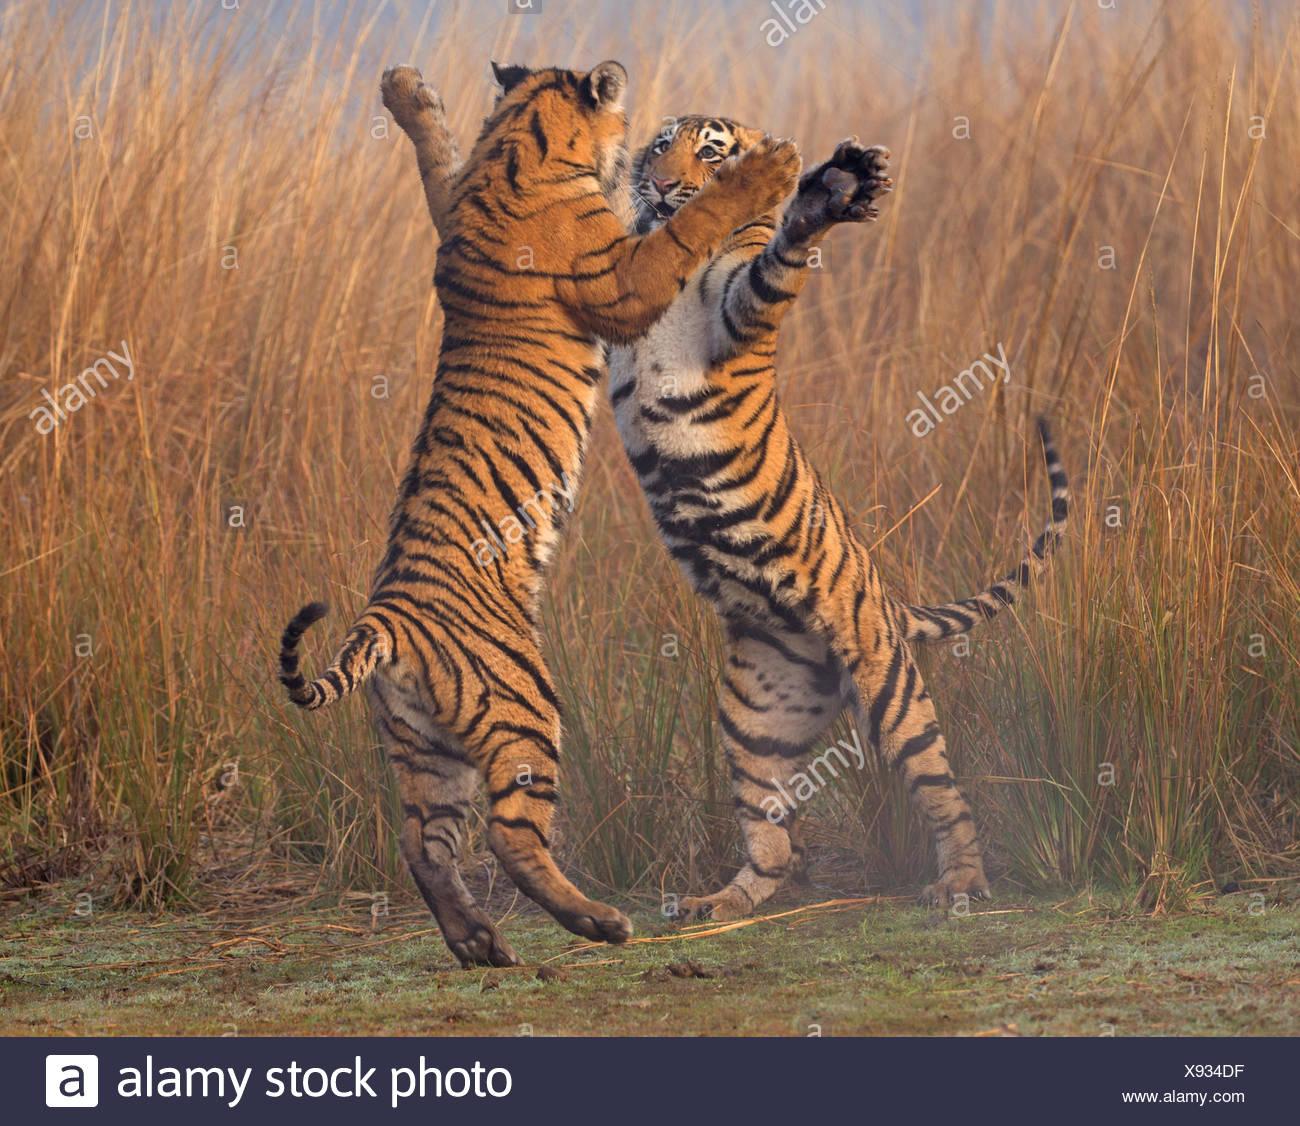 Tigre del Bengala (Panthera tigris tigris) 11 mese cubs giocare combattimenti, Ranthambhore National Park, India. Immagini Stock